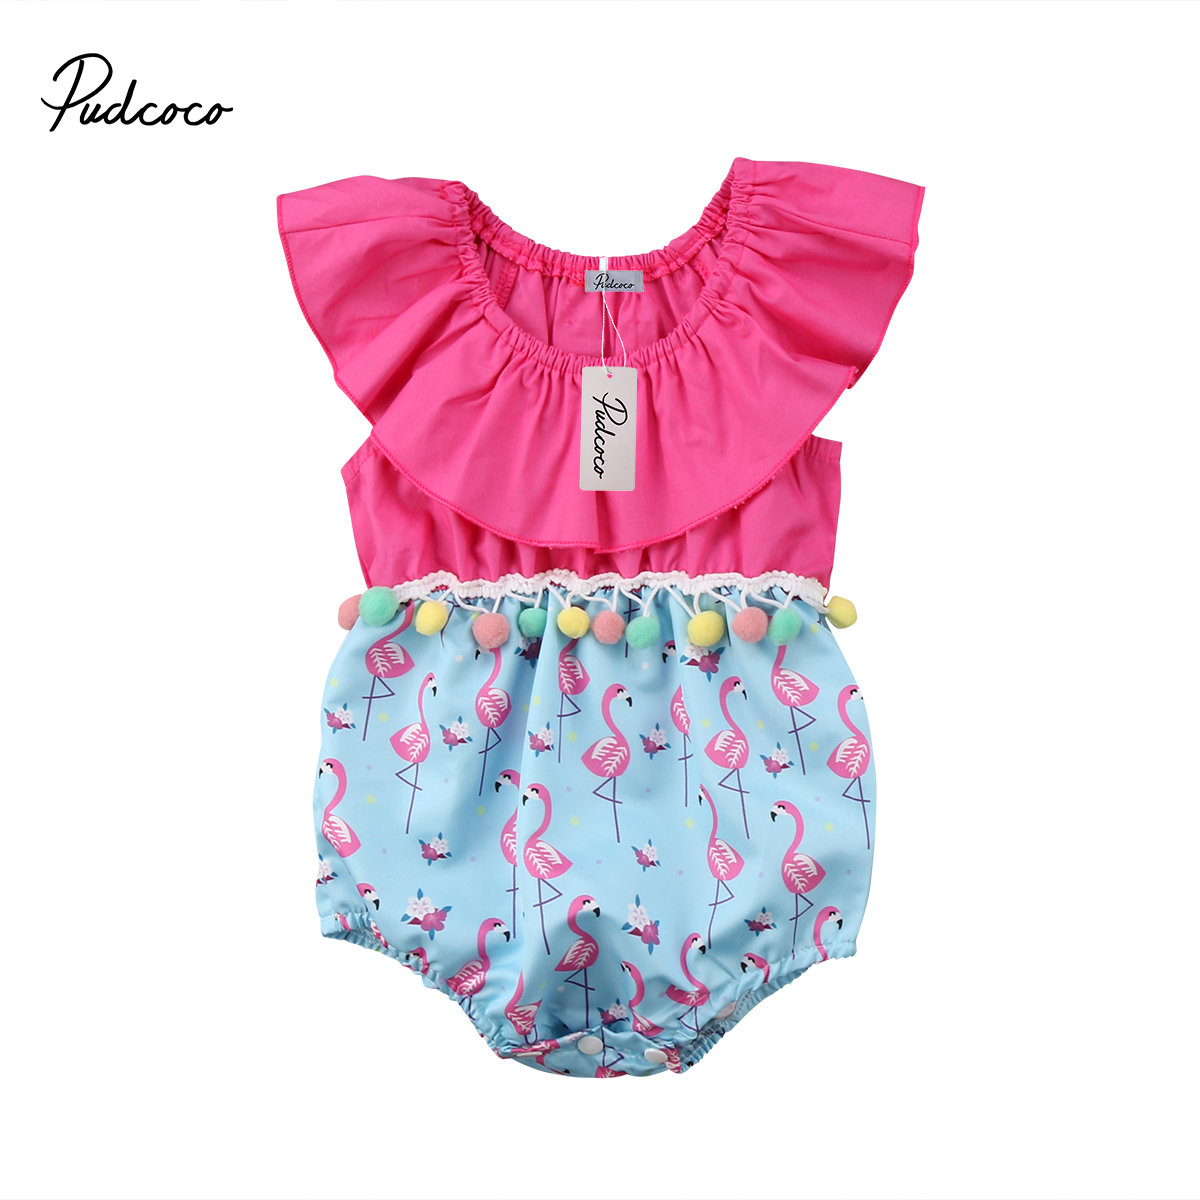 2018 Brand New Infant Toddler Newborn Flamingo Baby Girls ...